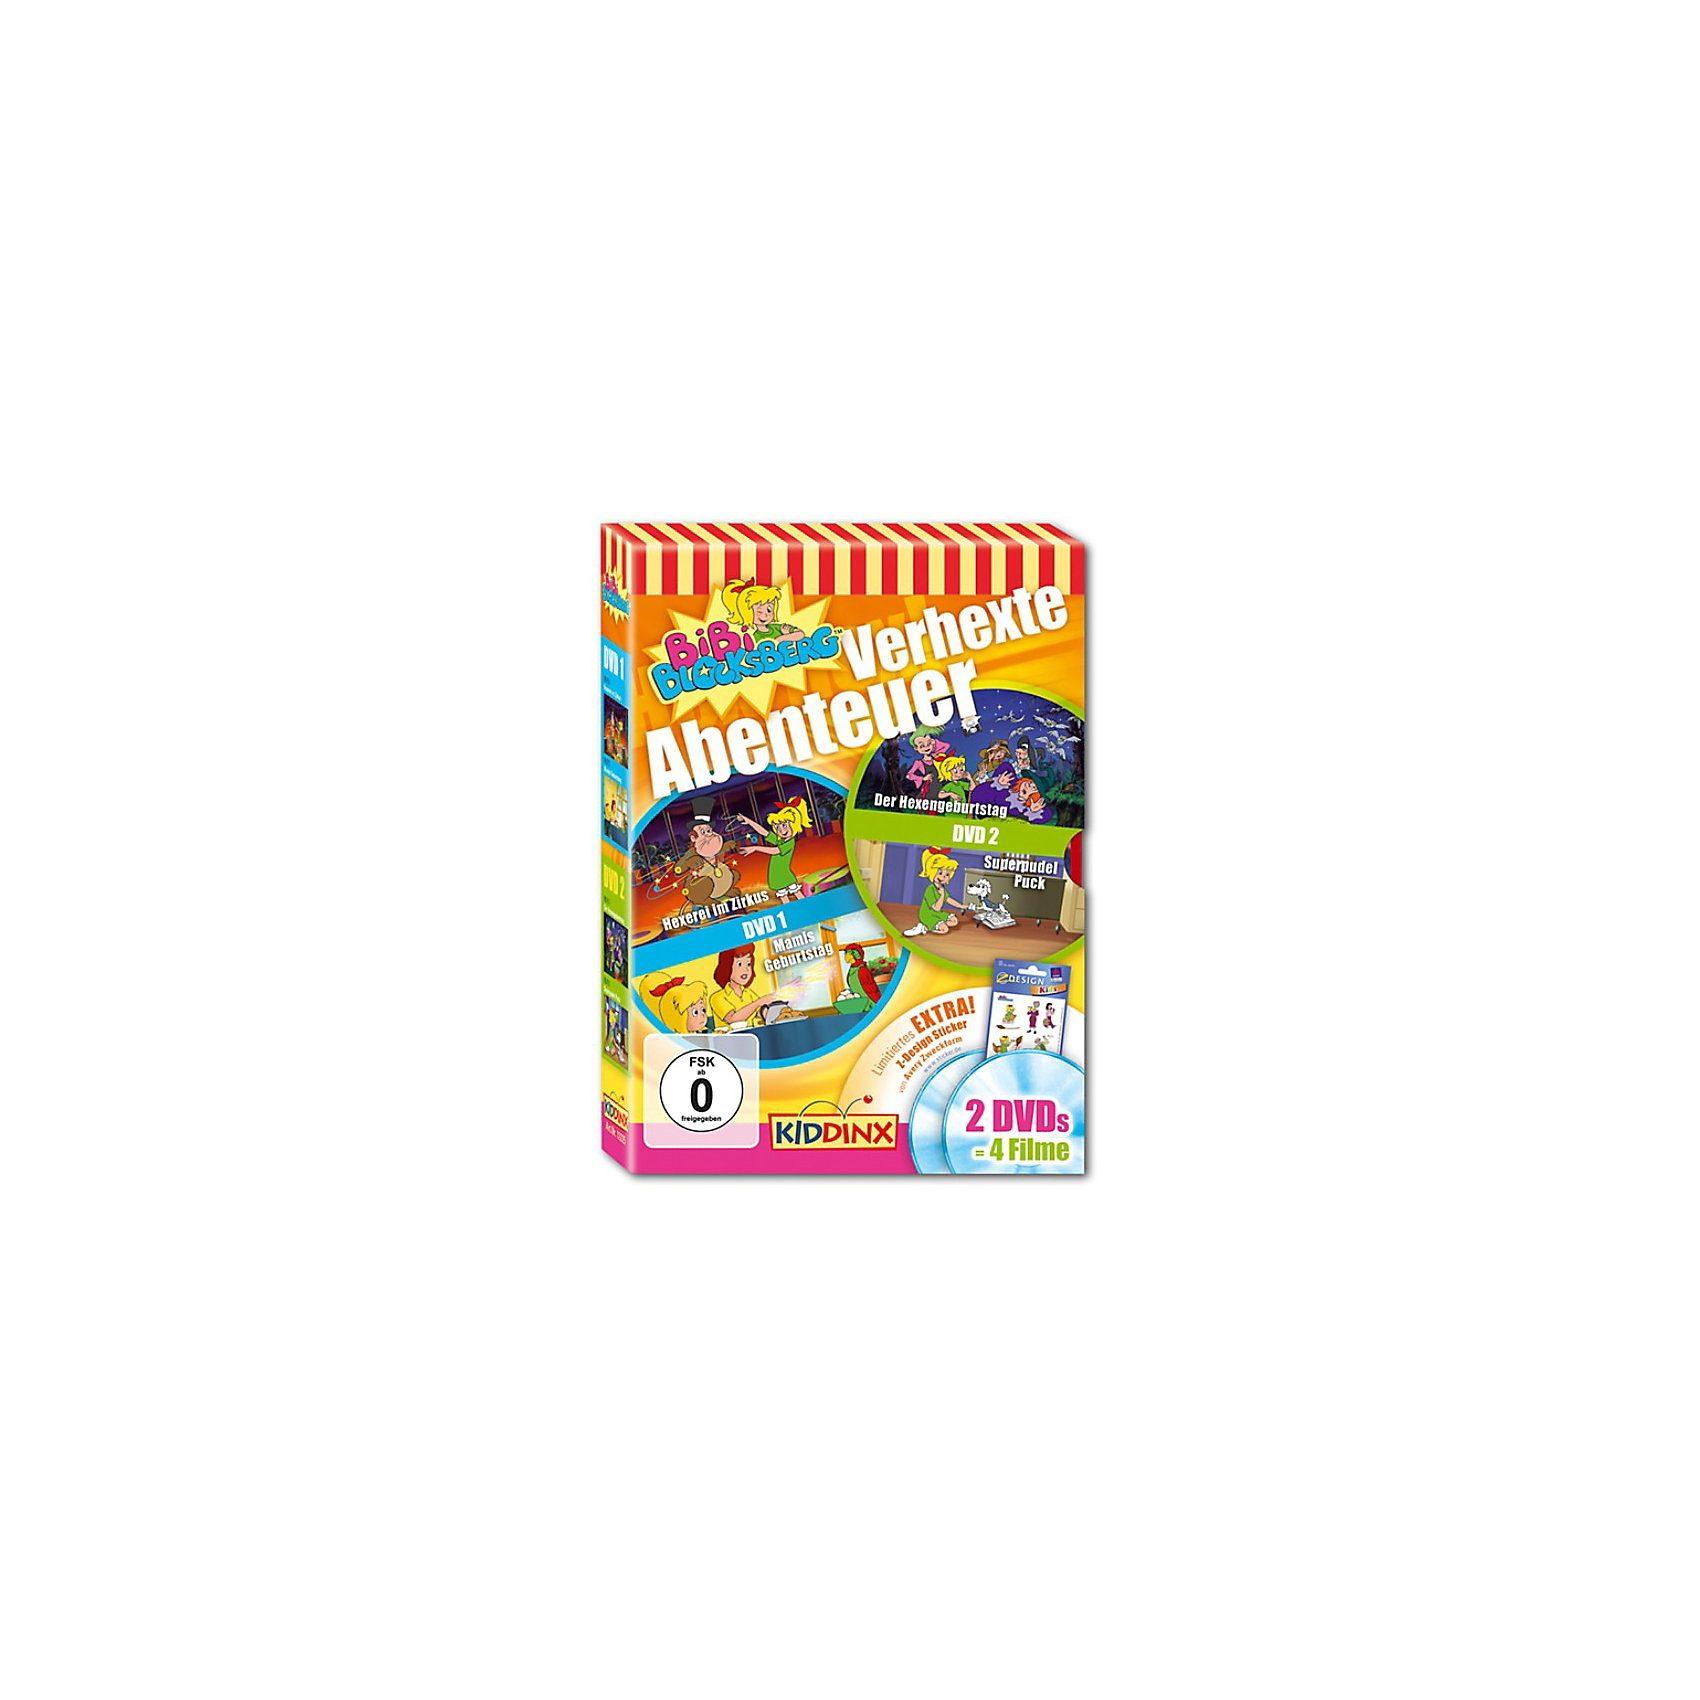 Kiddinx DVD Bibi Blocksberg - Verhexte Abenteuer - 2 DVDs